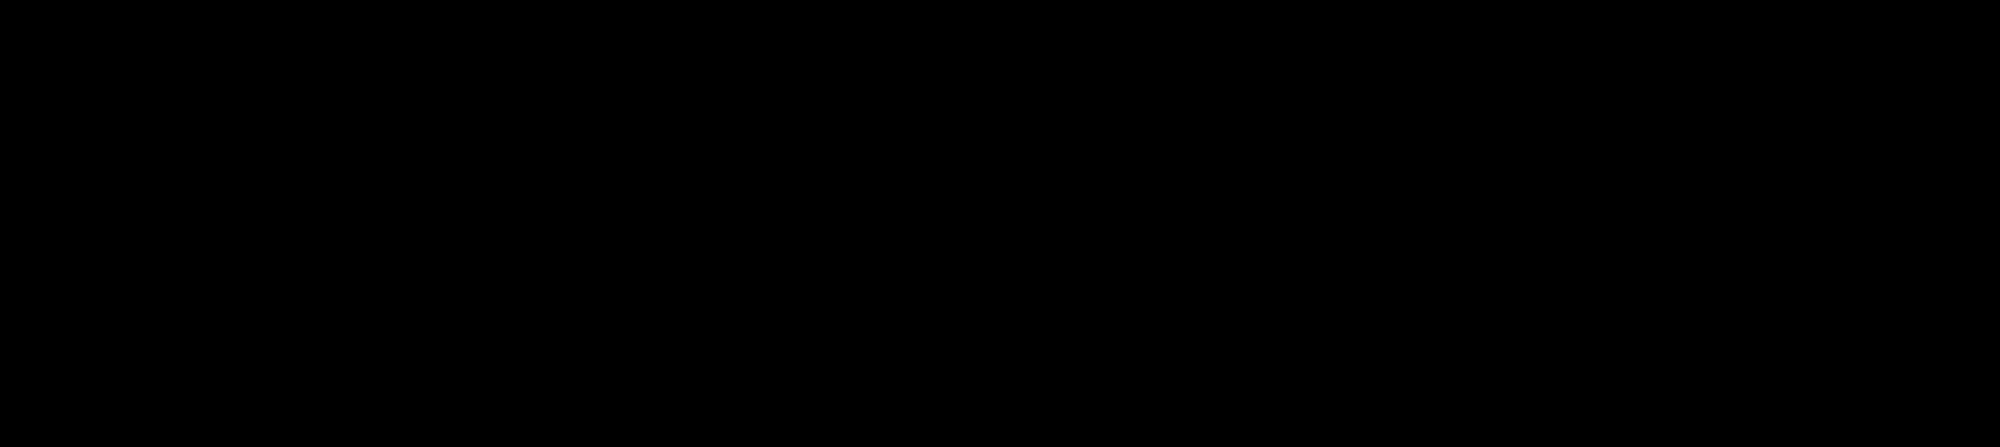 Paluma Benham timeline